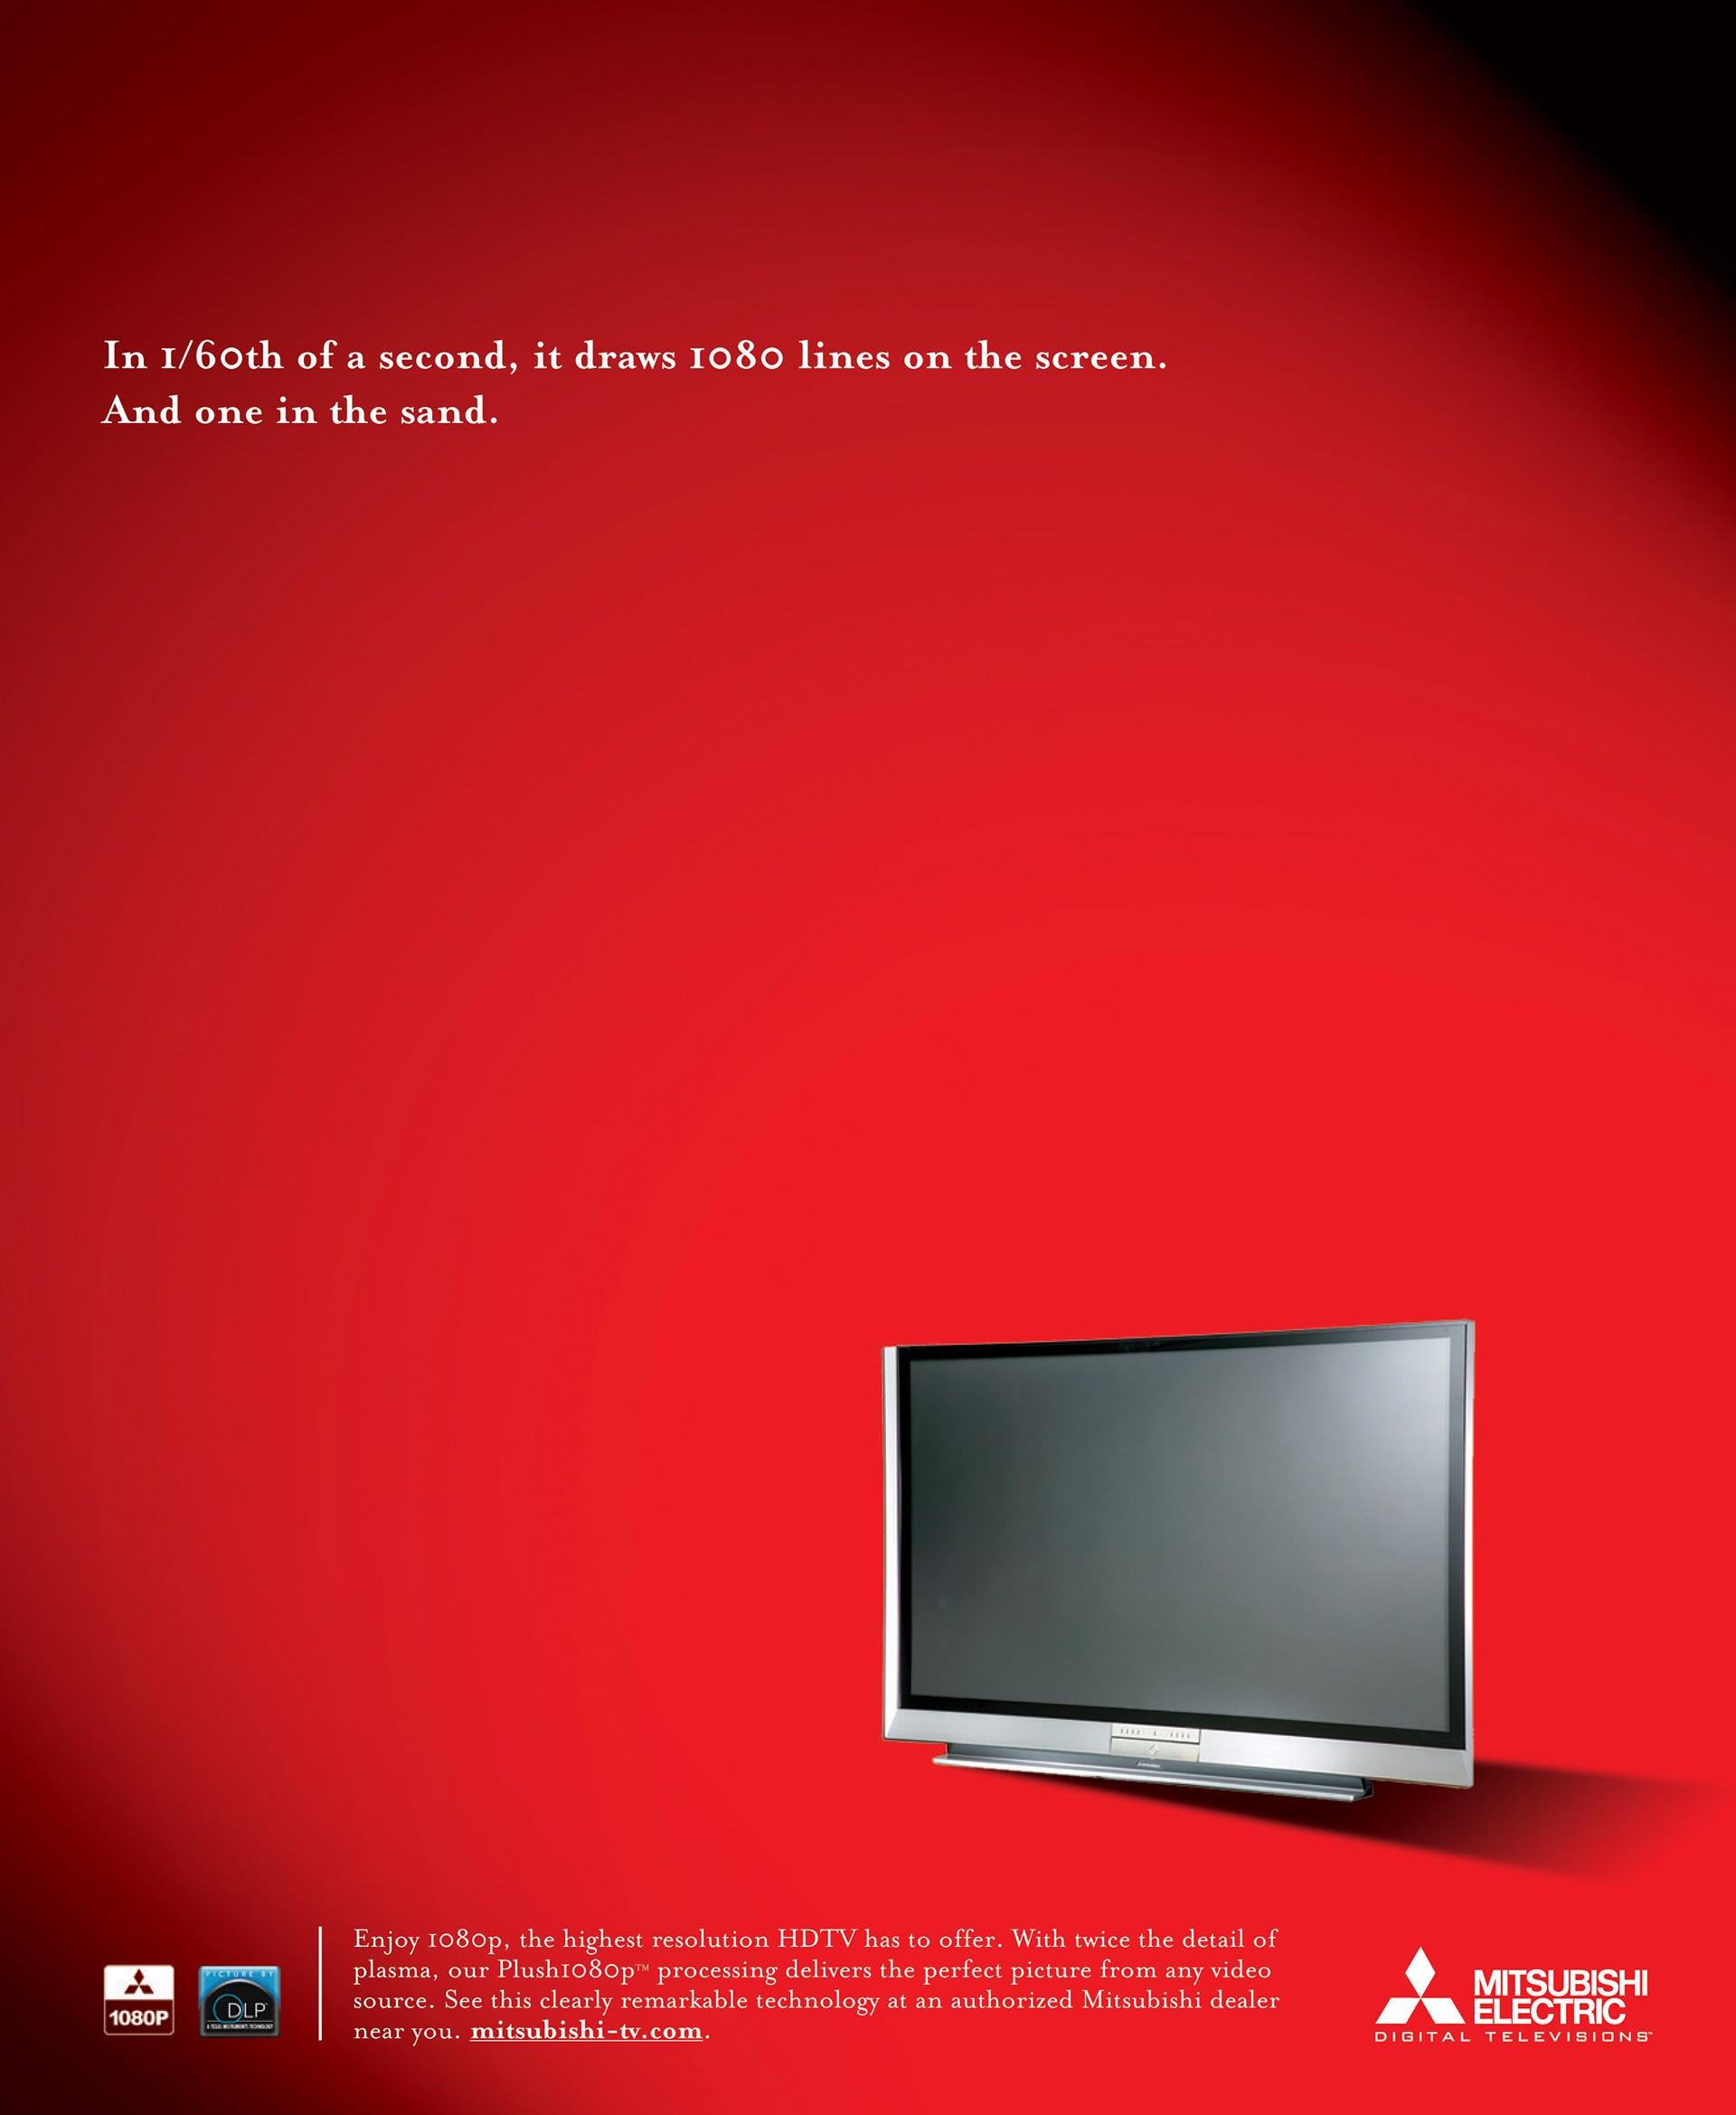 Mitsubishi Plasma Tv Car Hc3000 Projector Schematics Aaron Cheesman Electric